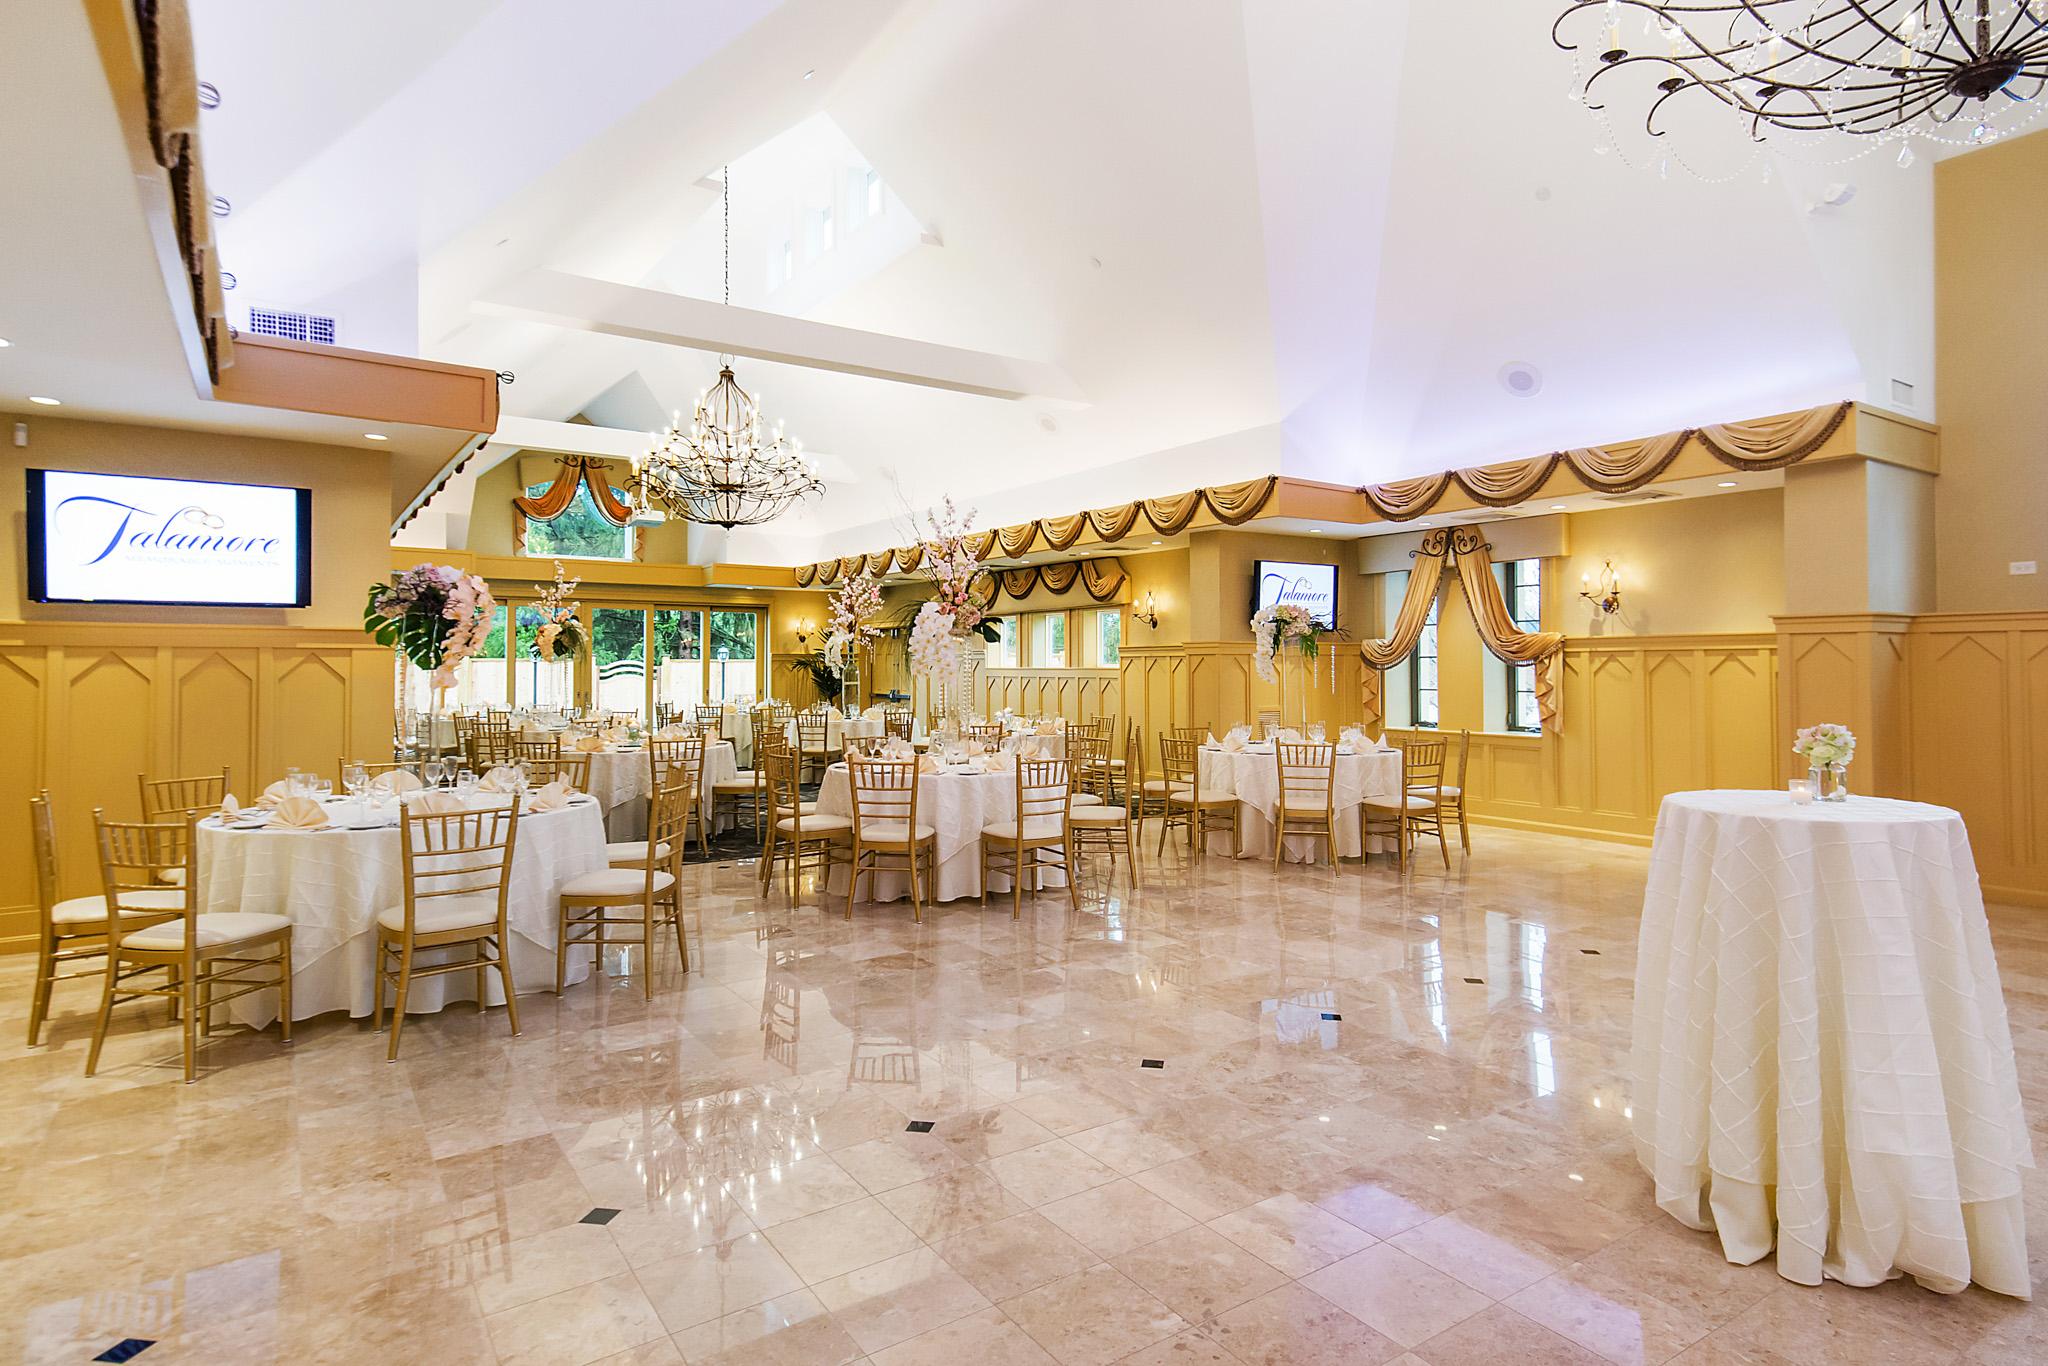 Magnolia Ballroom